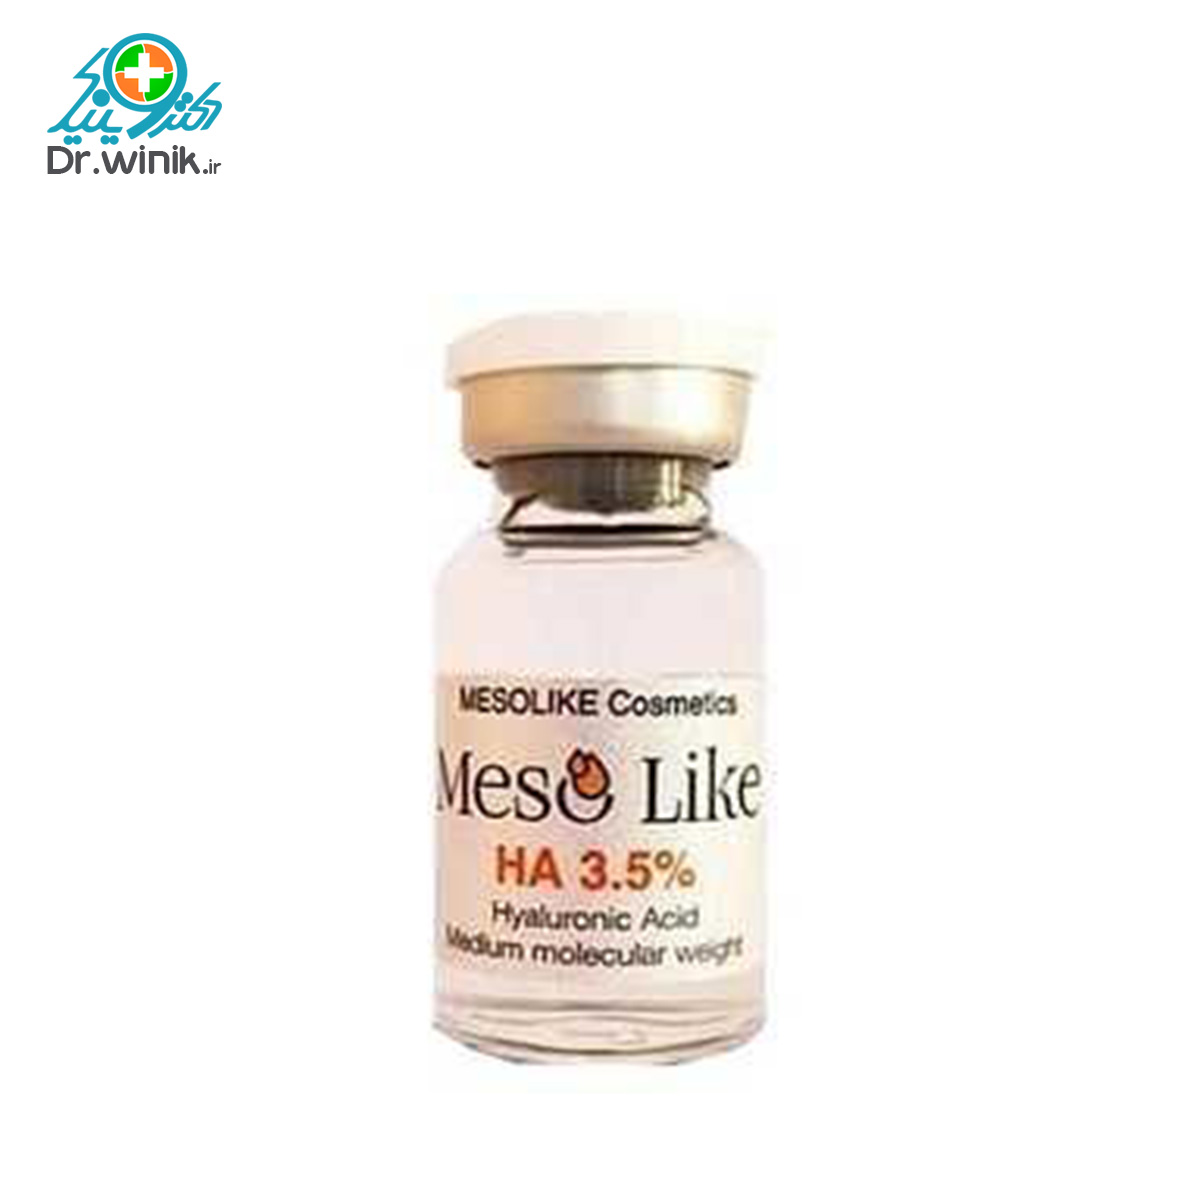 تصویر کوکتل مزولایک هیالورونیک اسید 3/5 درصد